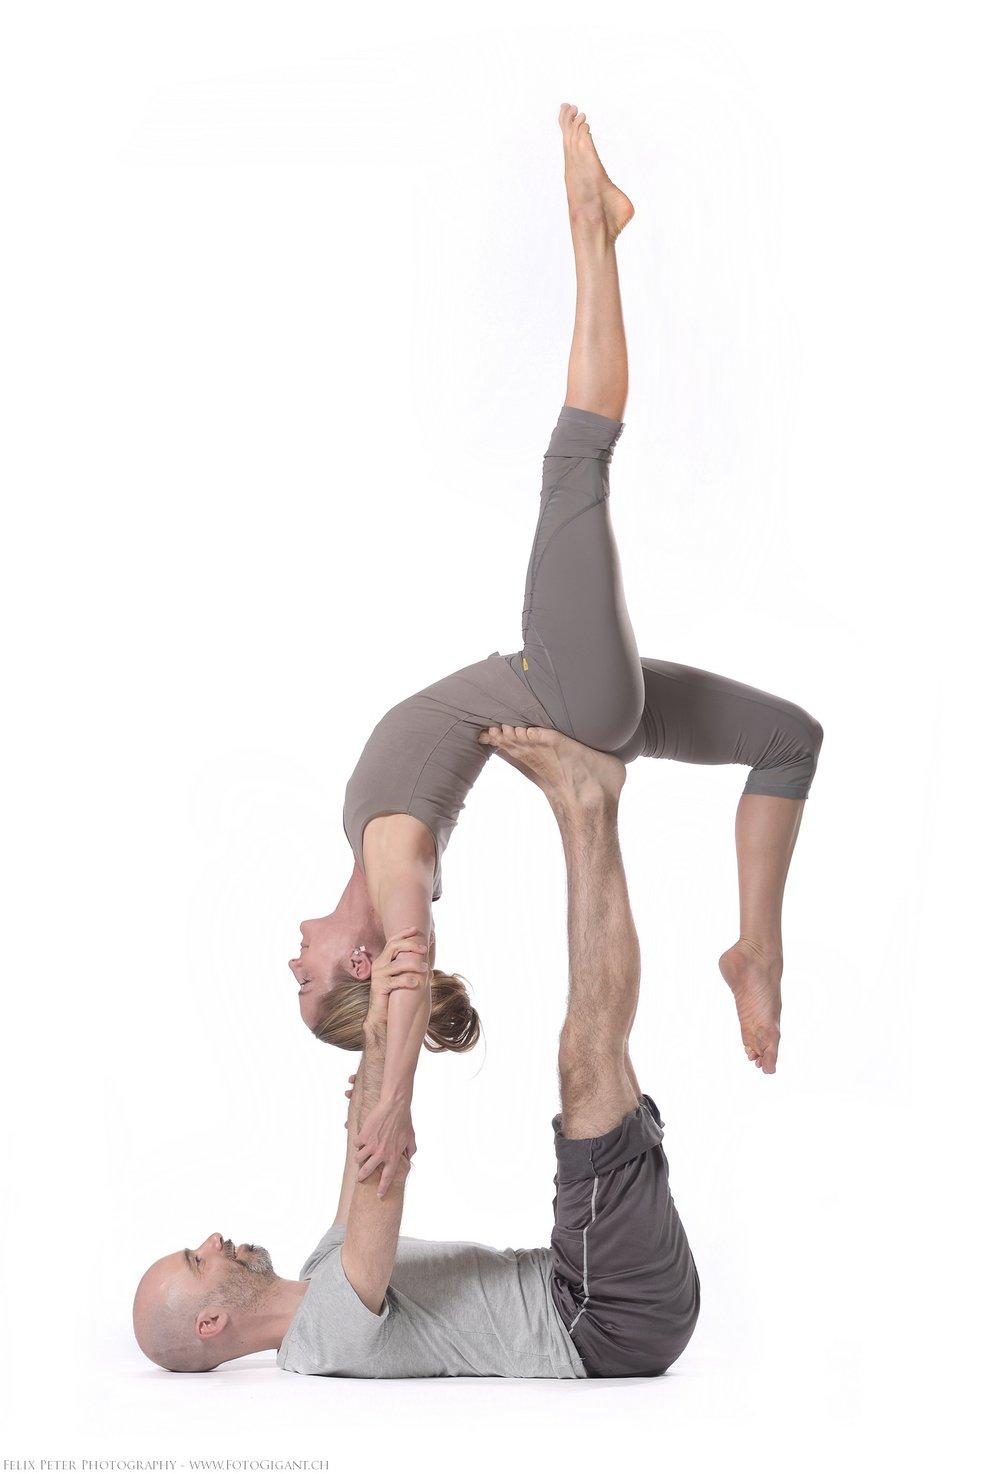 Felix-Peter-Yoga-Pilates-Dance-Fotografie_Bern_034.jpg